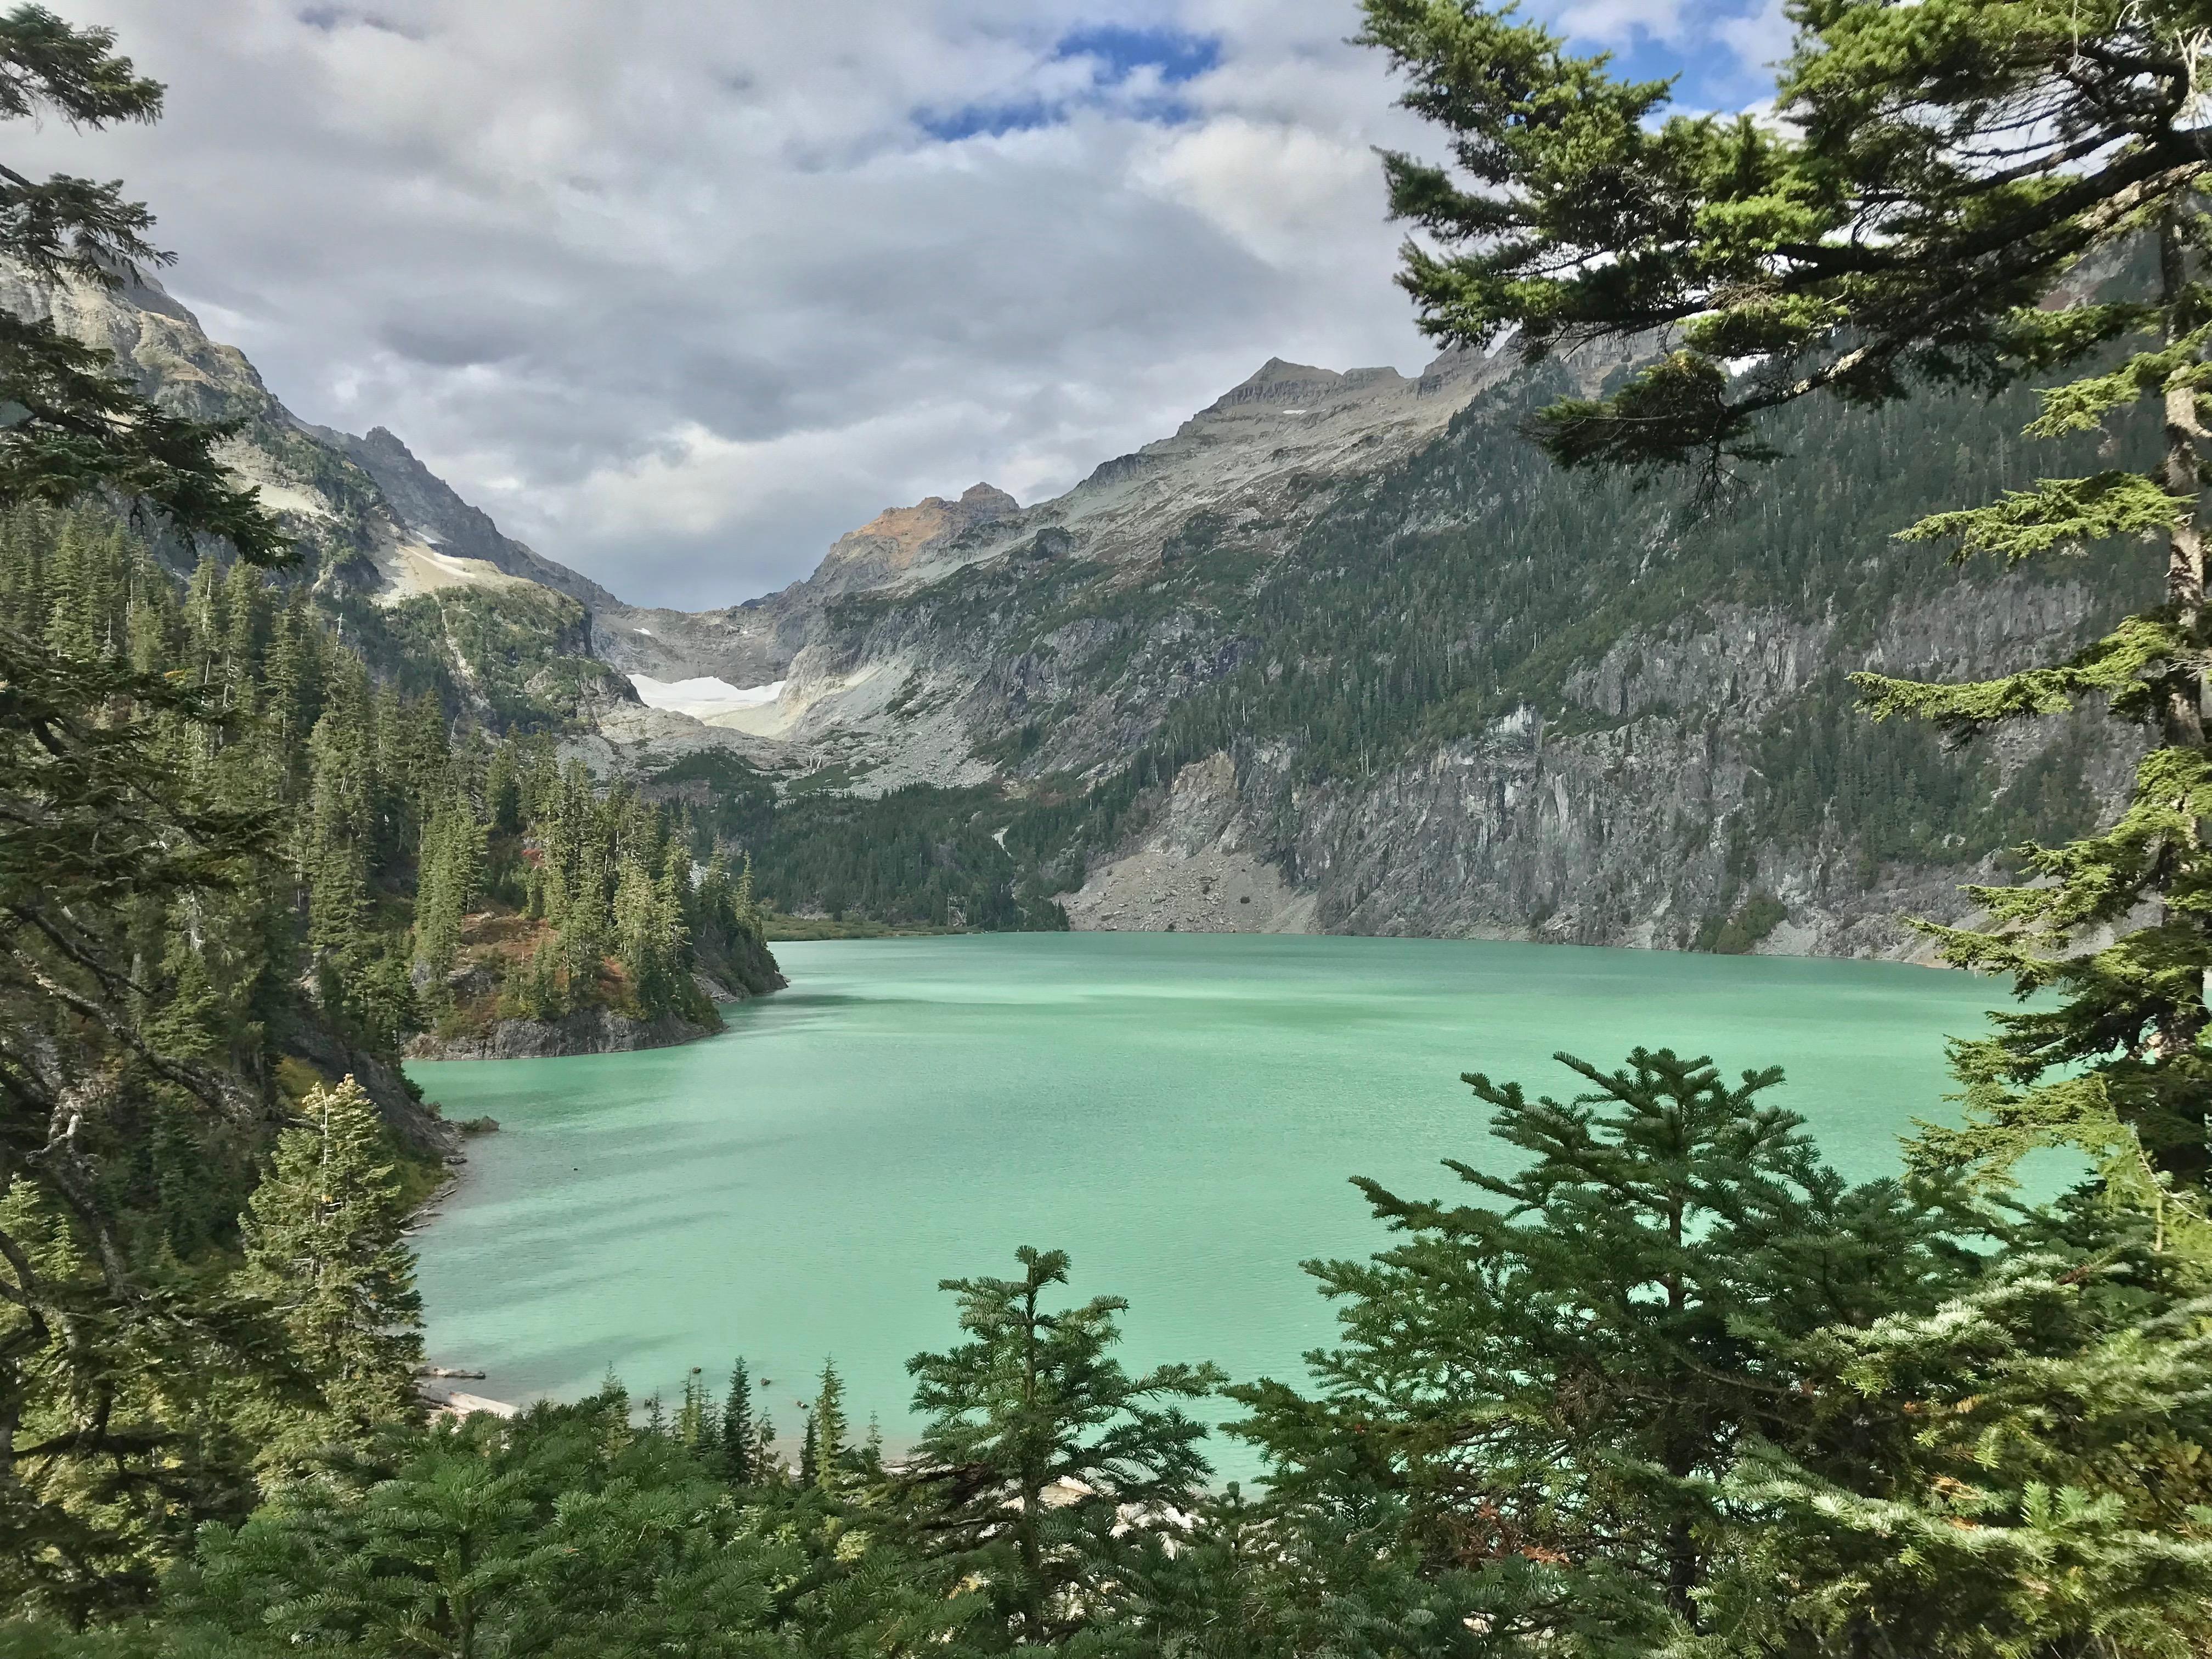 Unedited Photo Of Blanca Lake During The Fall Henry M Jackson Wilderness Washington State Usa 4032x3024 Oc Http Bi Unedited Photos Photo Earth Photos